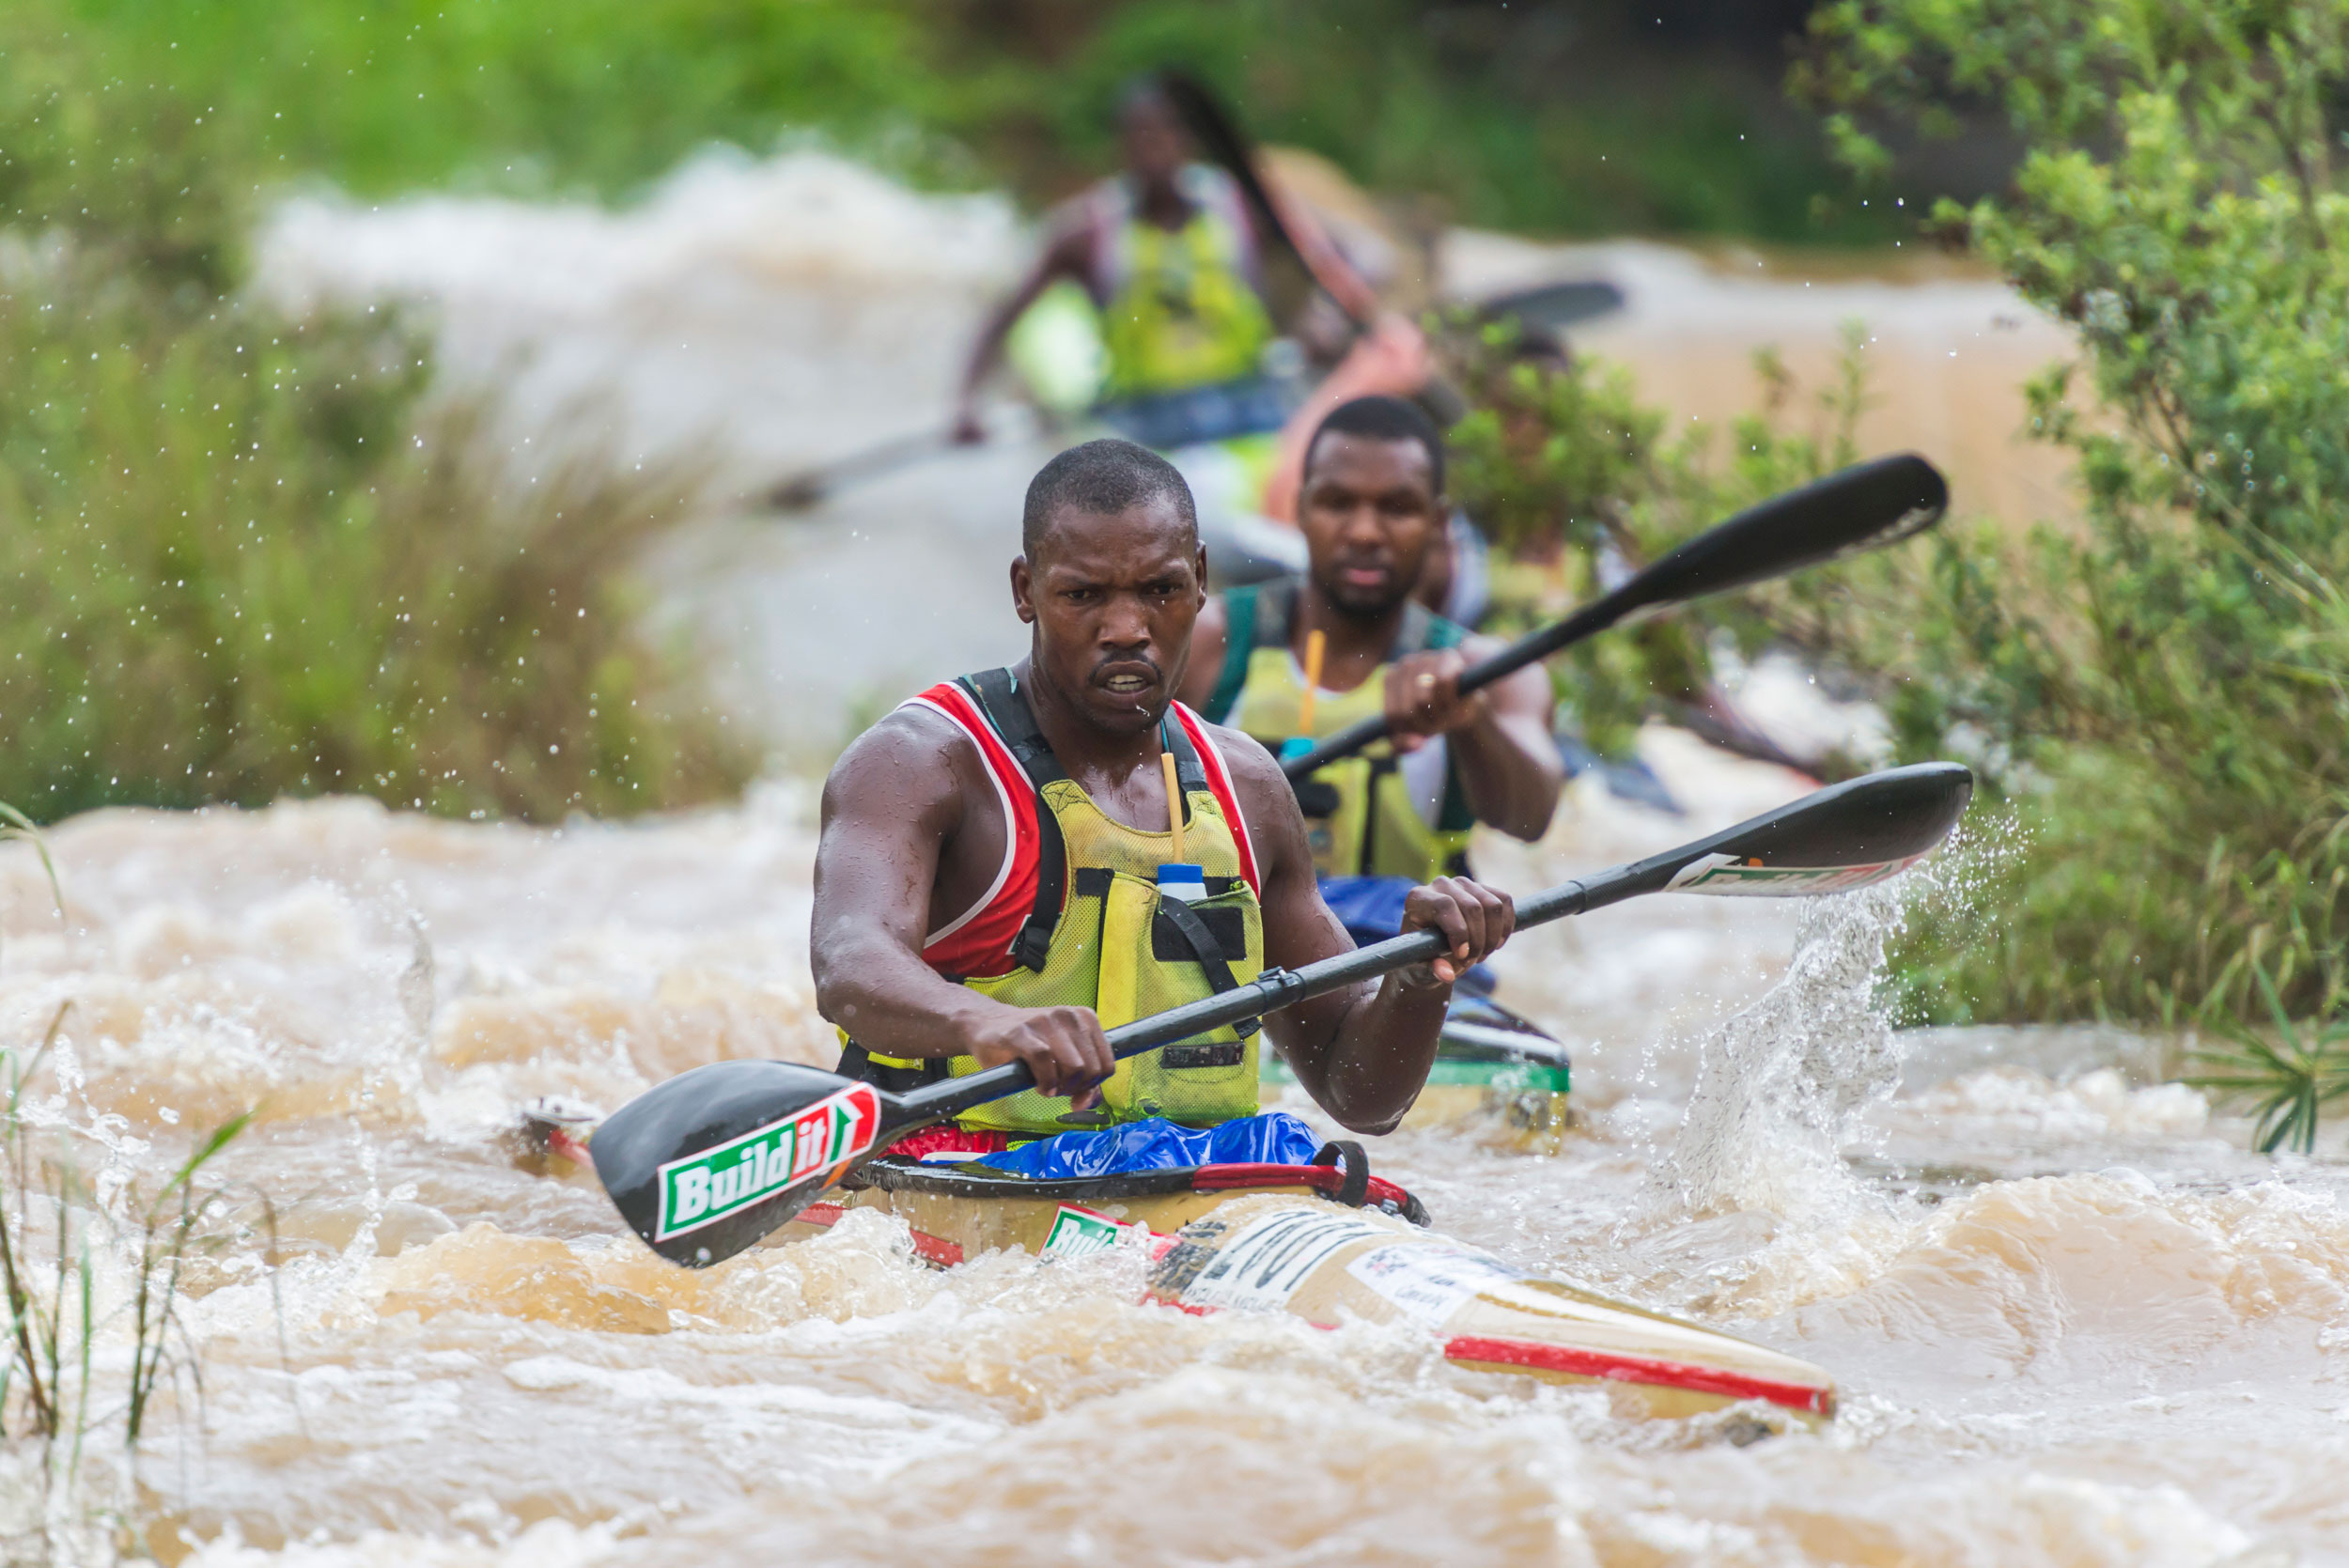 Mbanjwa has to juggle work and training as Dusi nears